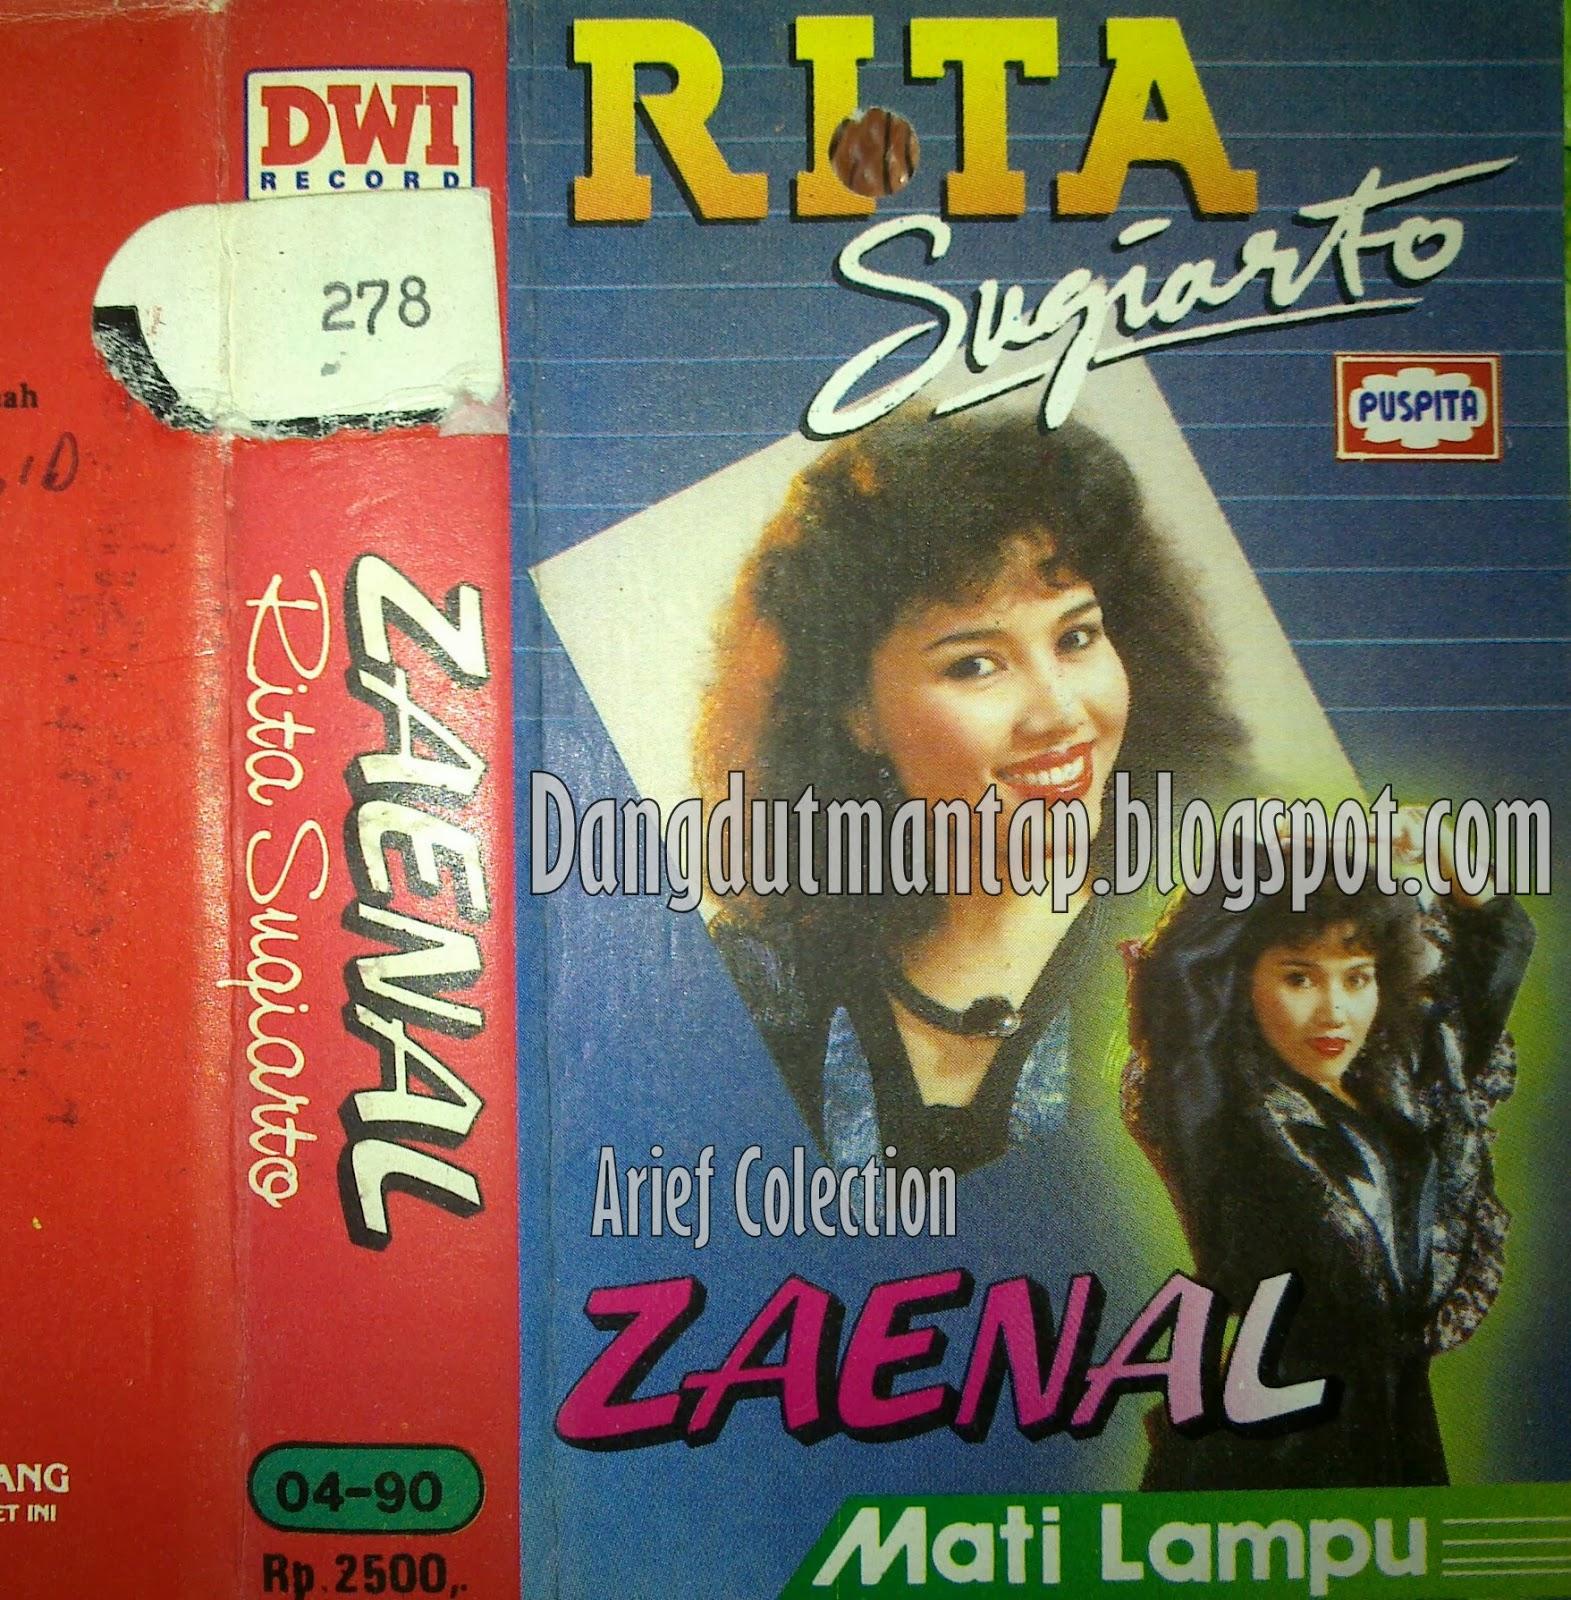 Download Lagu Rita Sugiarto - Zaenal Tahun 1990 Puspita Record